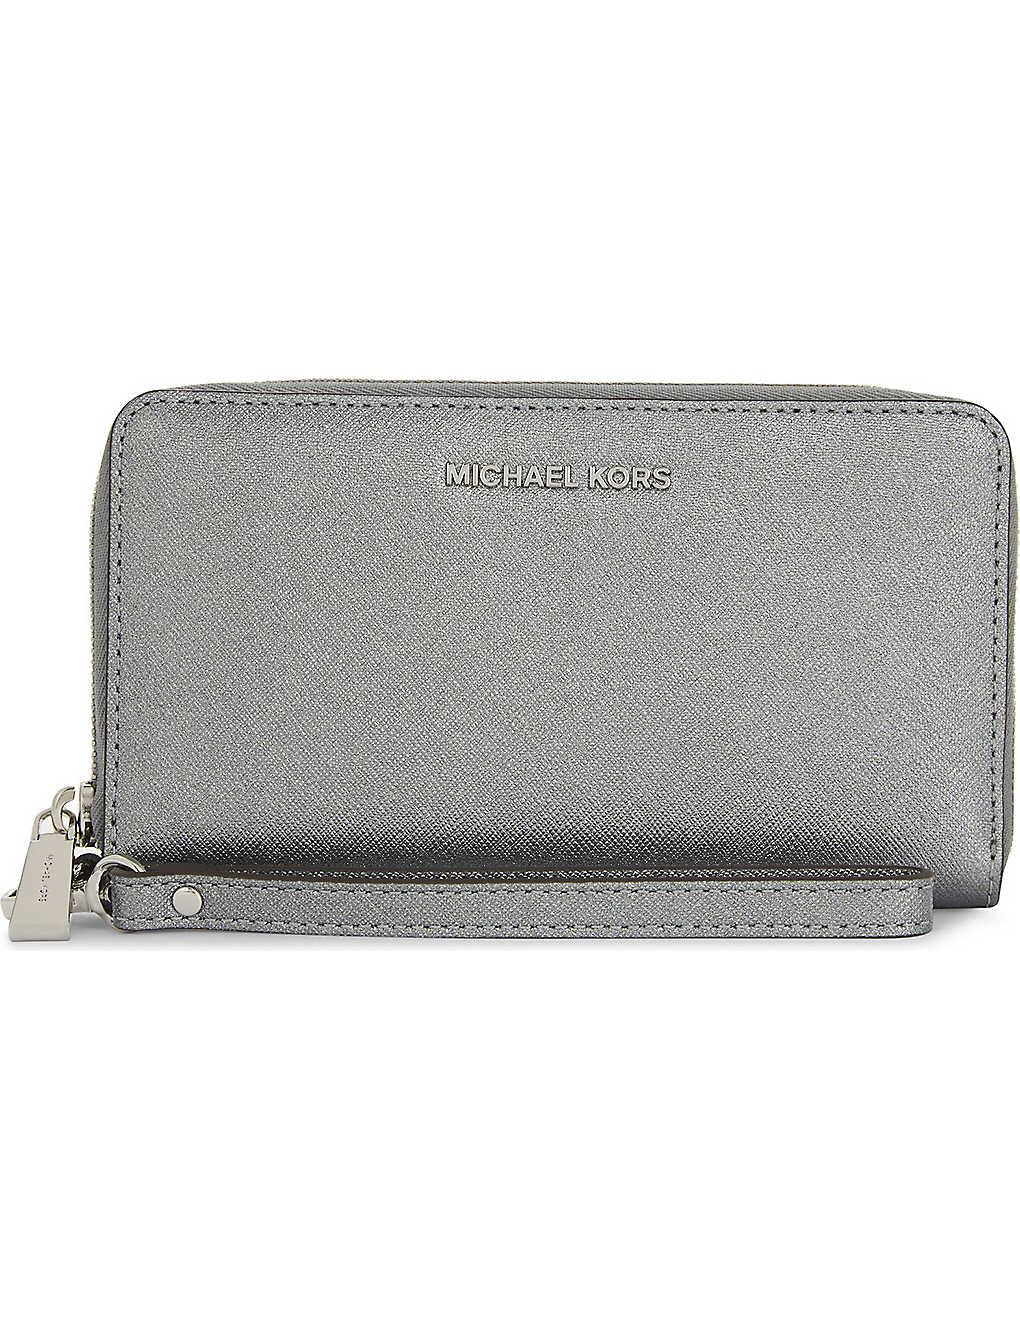 MICHAEL MICHAEL KORS - Jet set travel leather purse   Selfridges.com 1c95fa3e5d